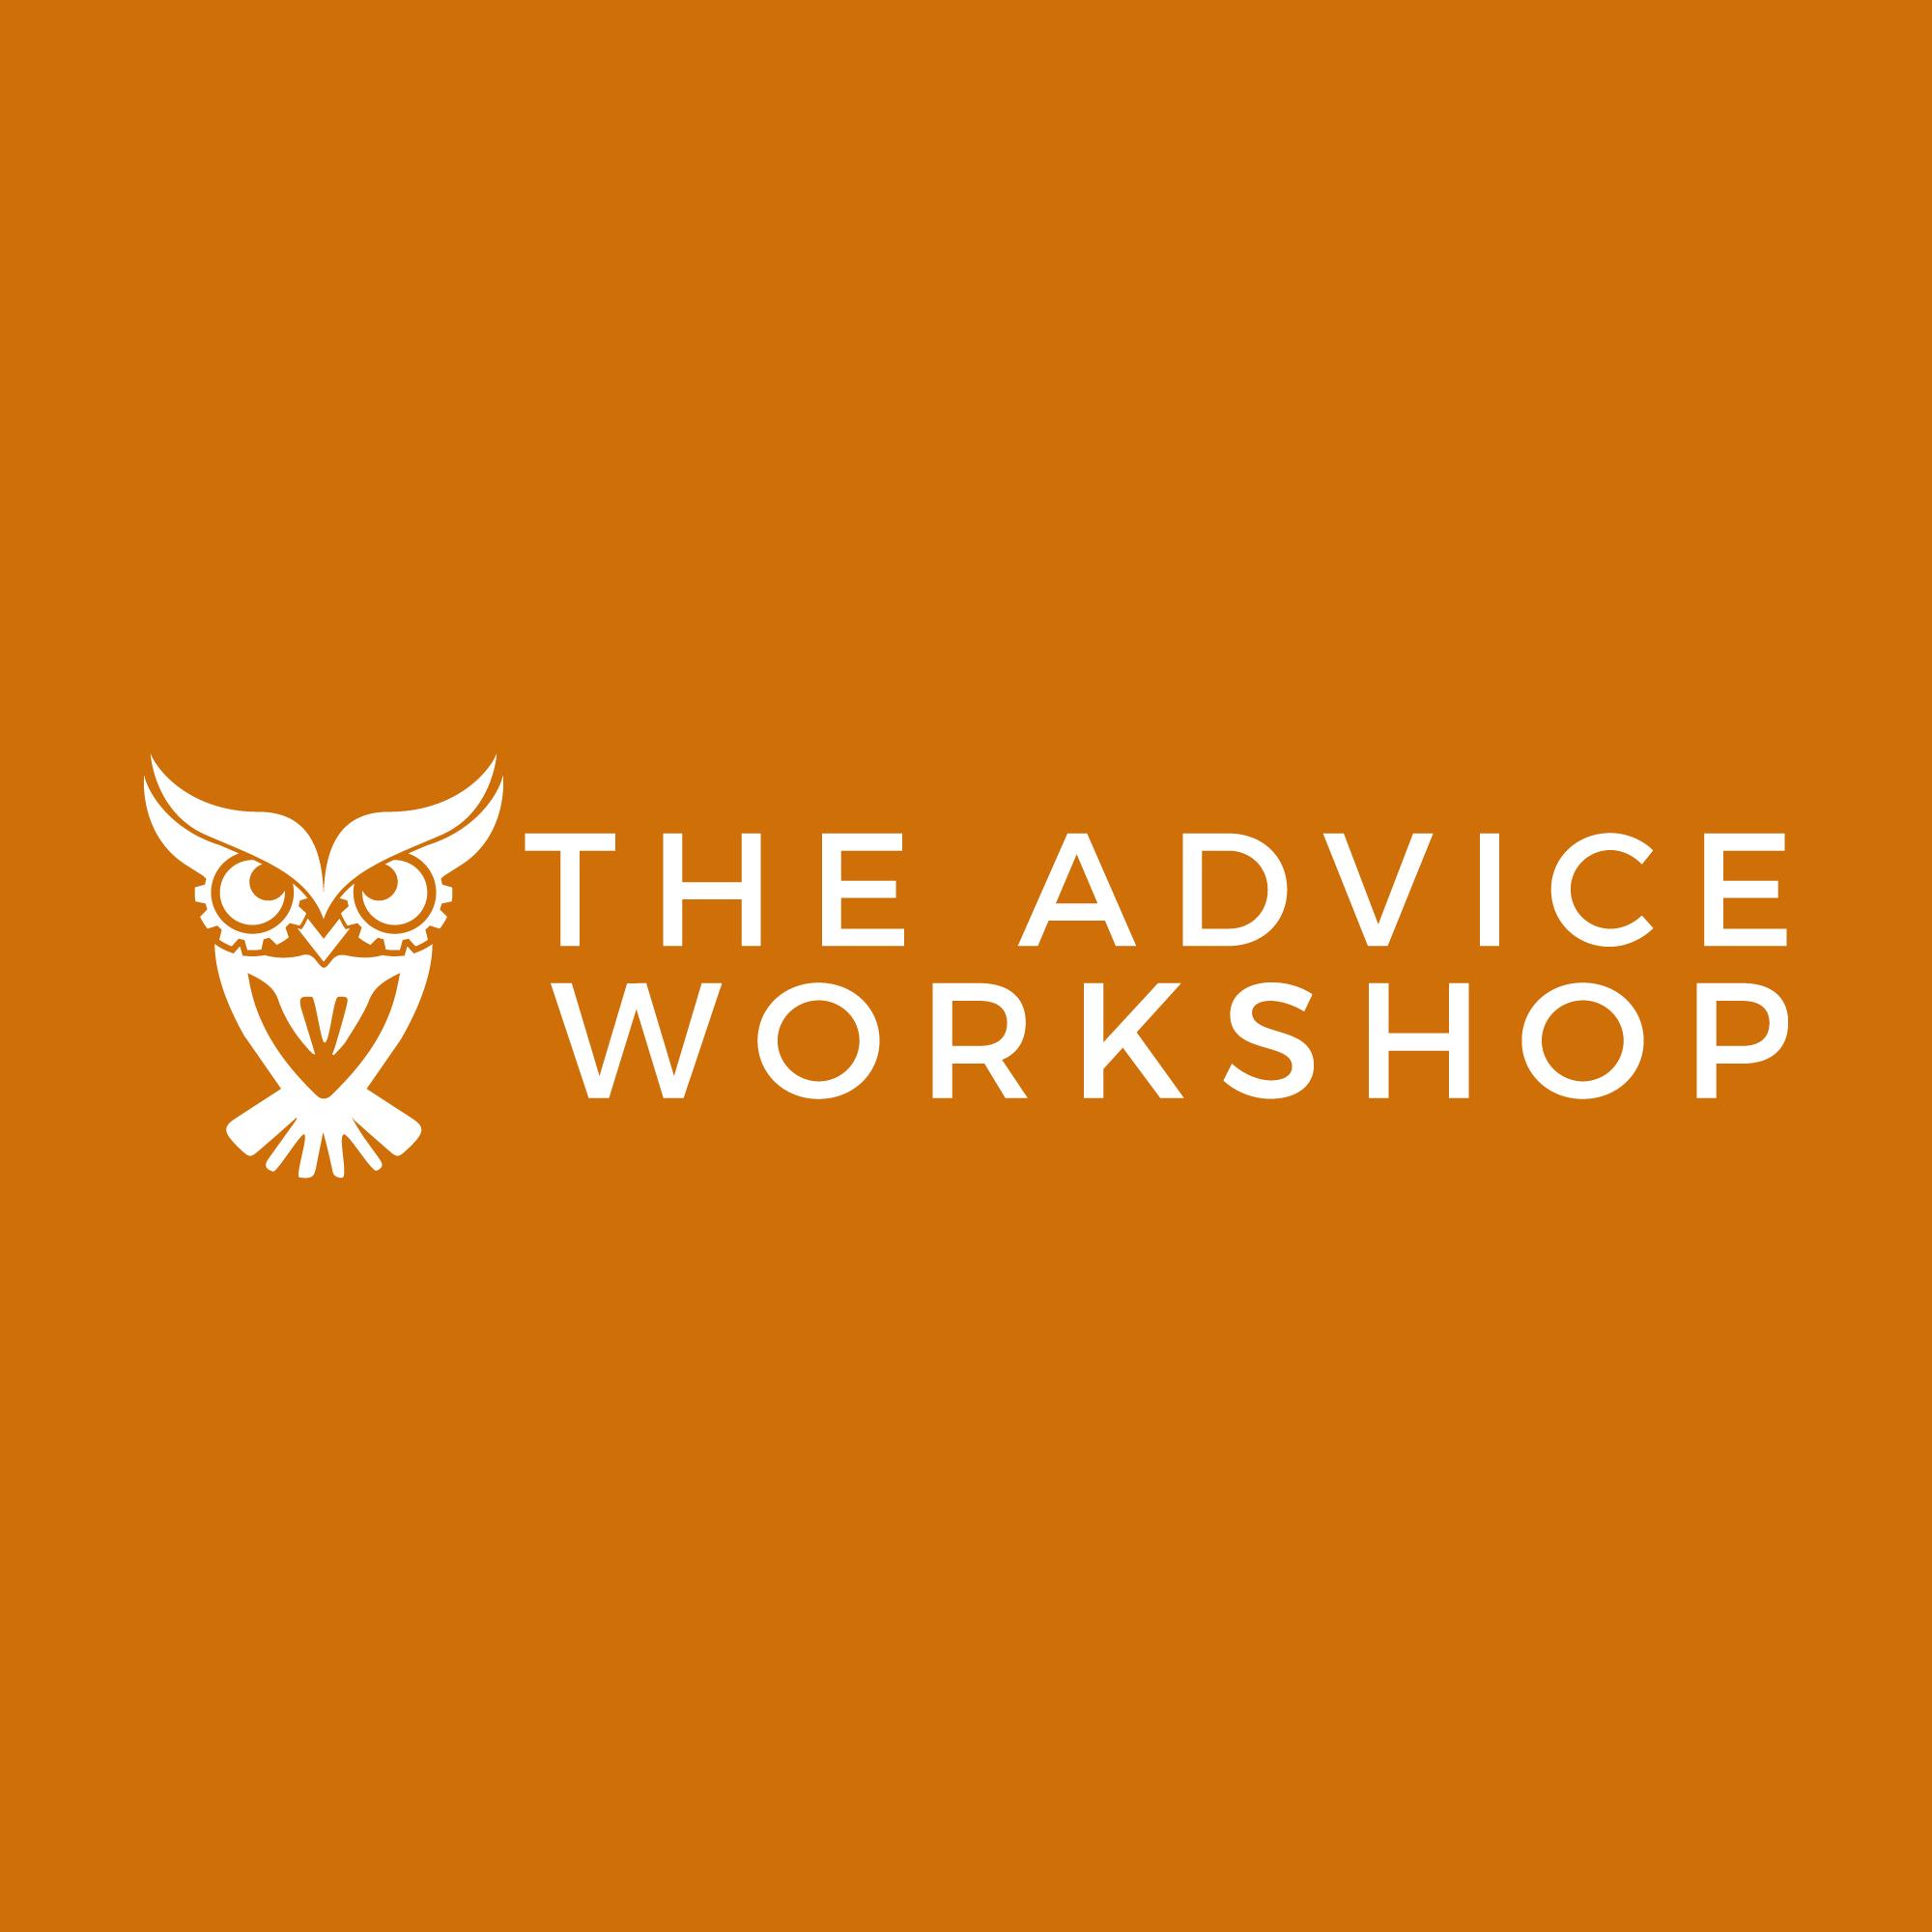 The-Advice-Workshop-Logo-B3 (1).jpg